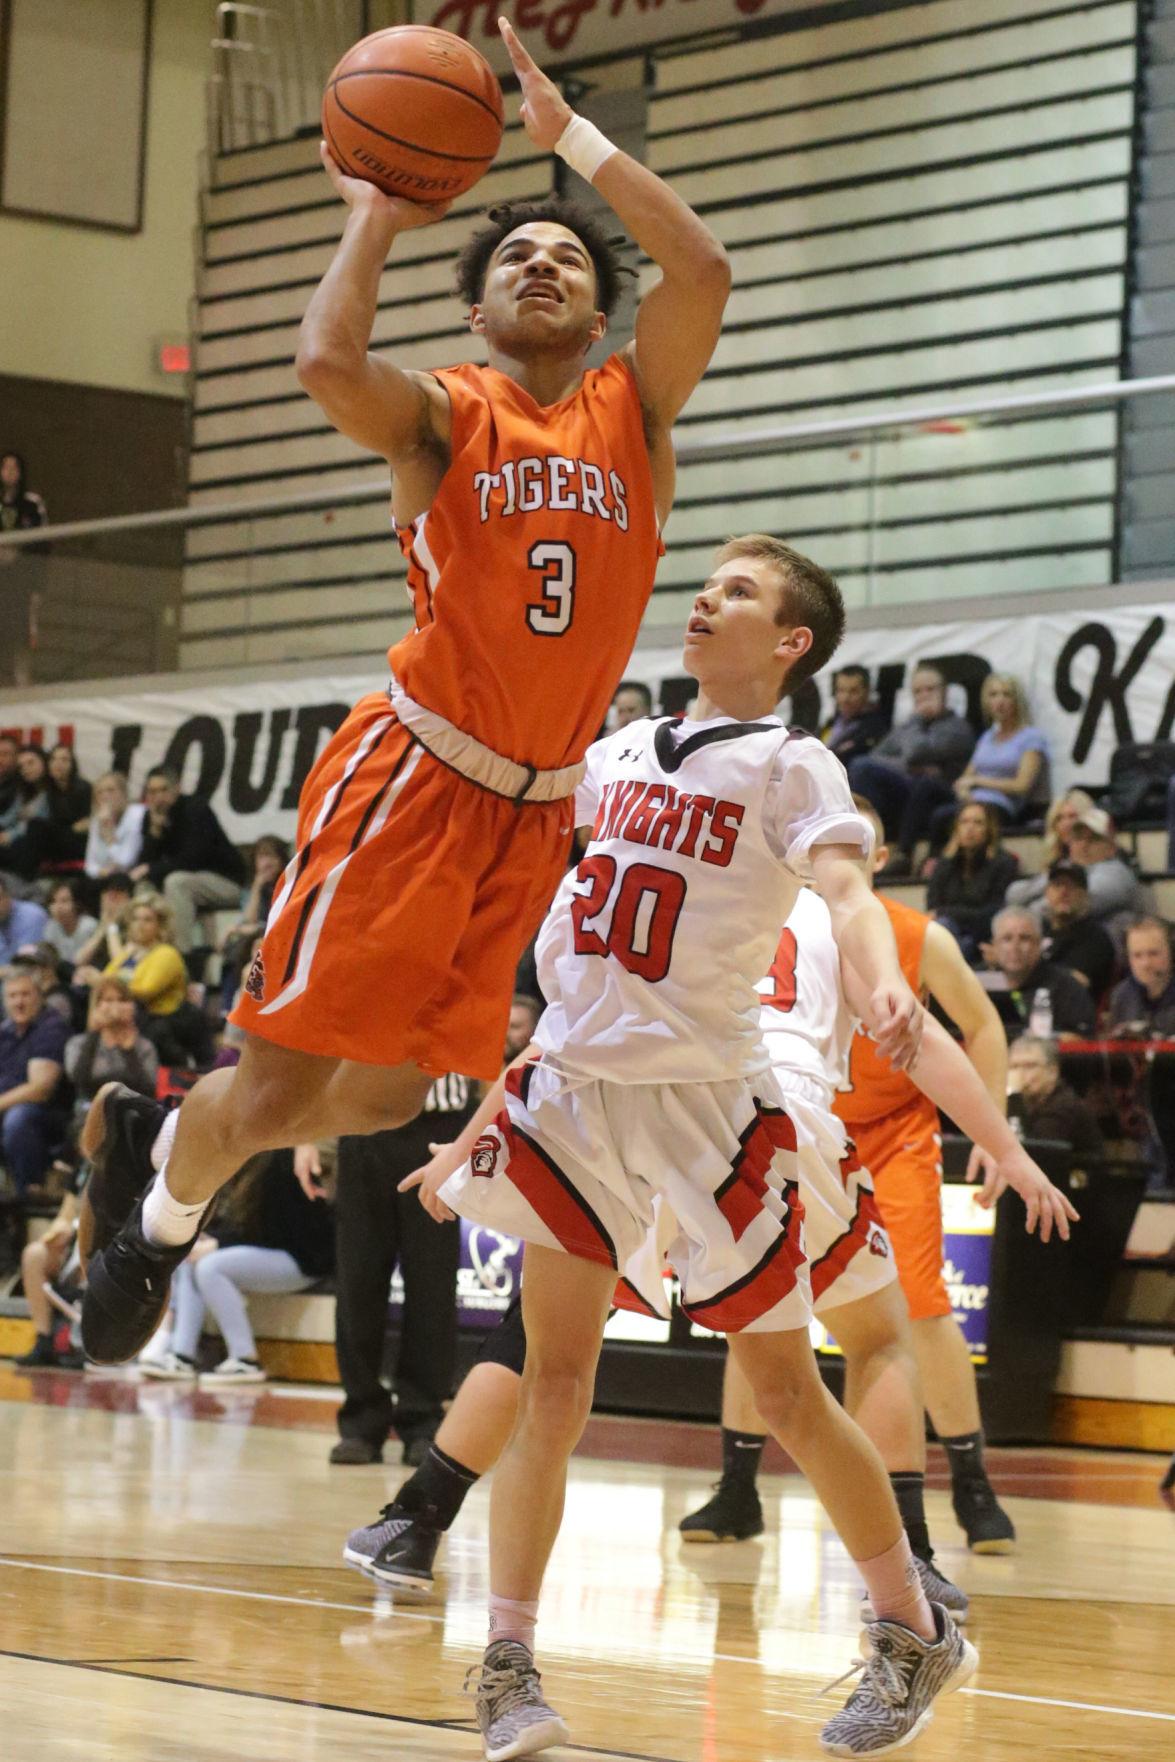 Hillcrest vs Idaho Falls boys basketball